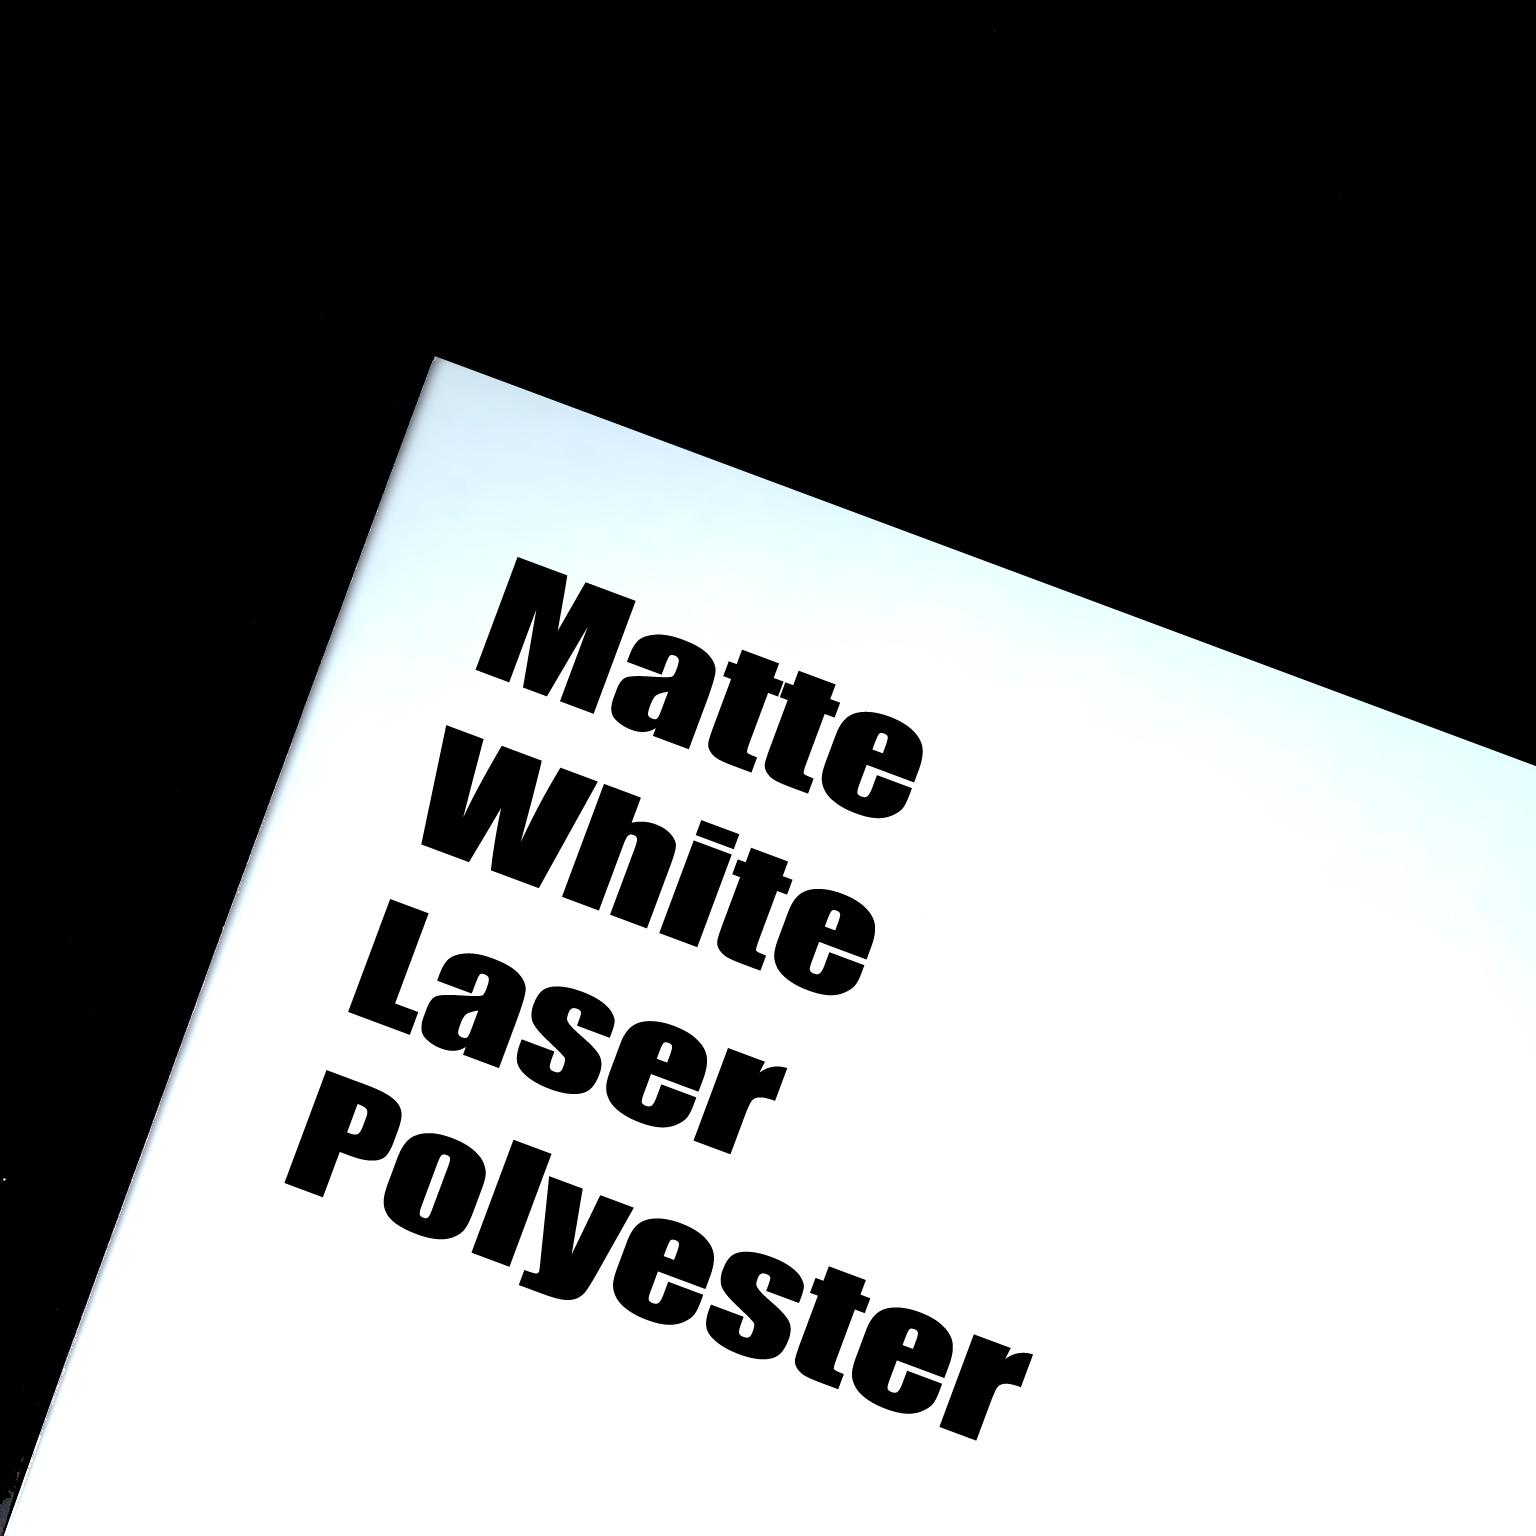 Matte White Laser Polyester Adhesive Film 8 5 X 11 100